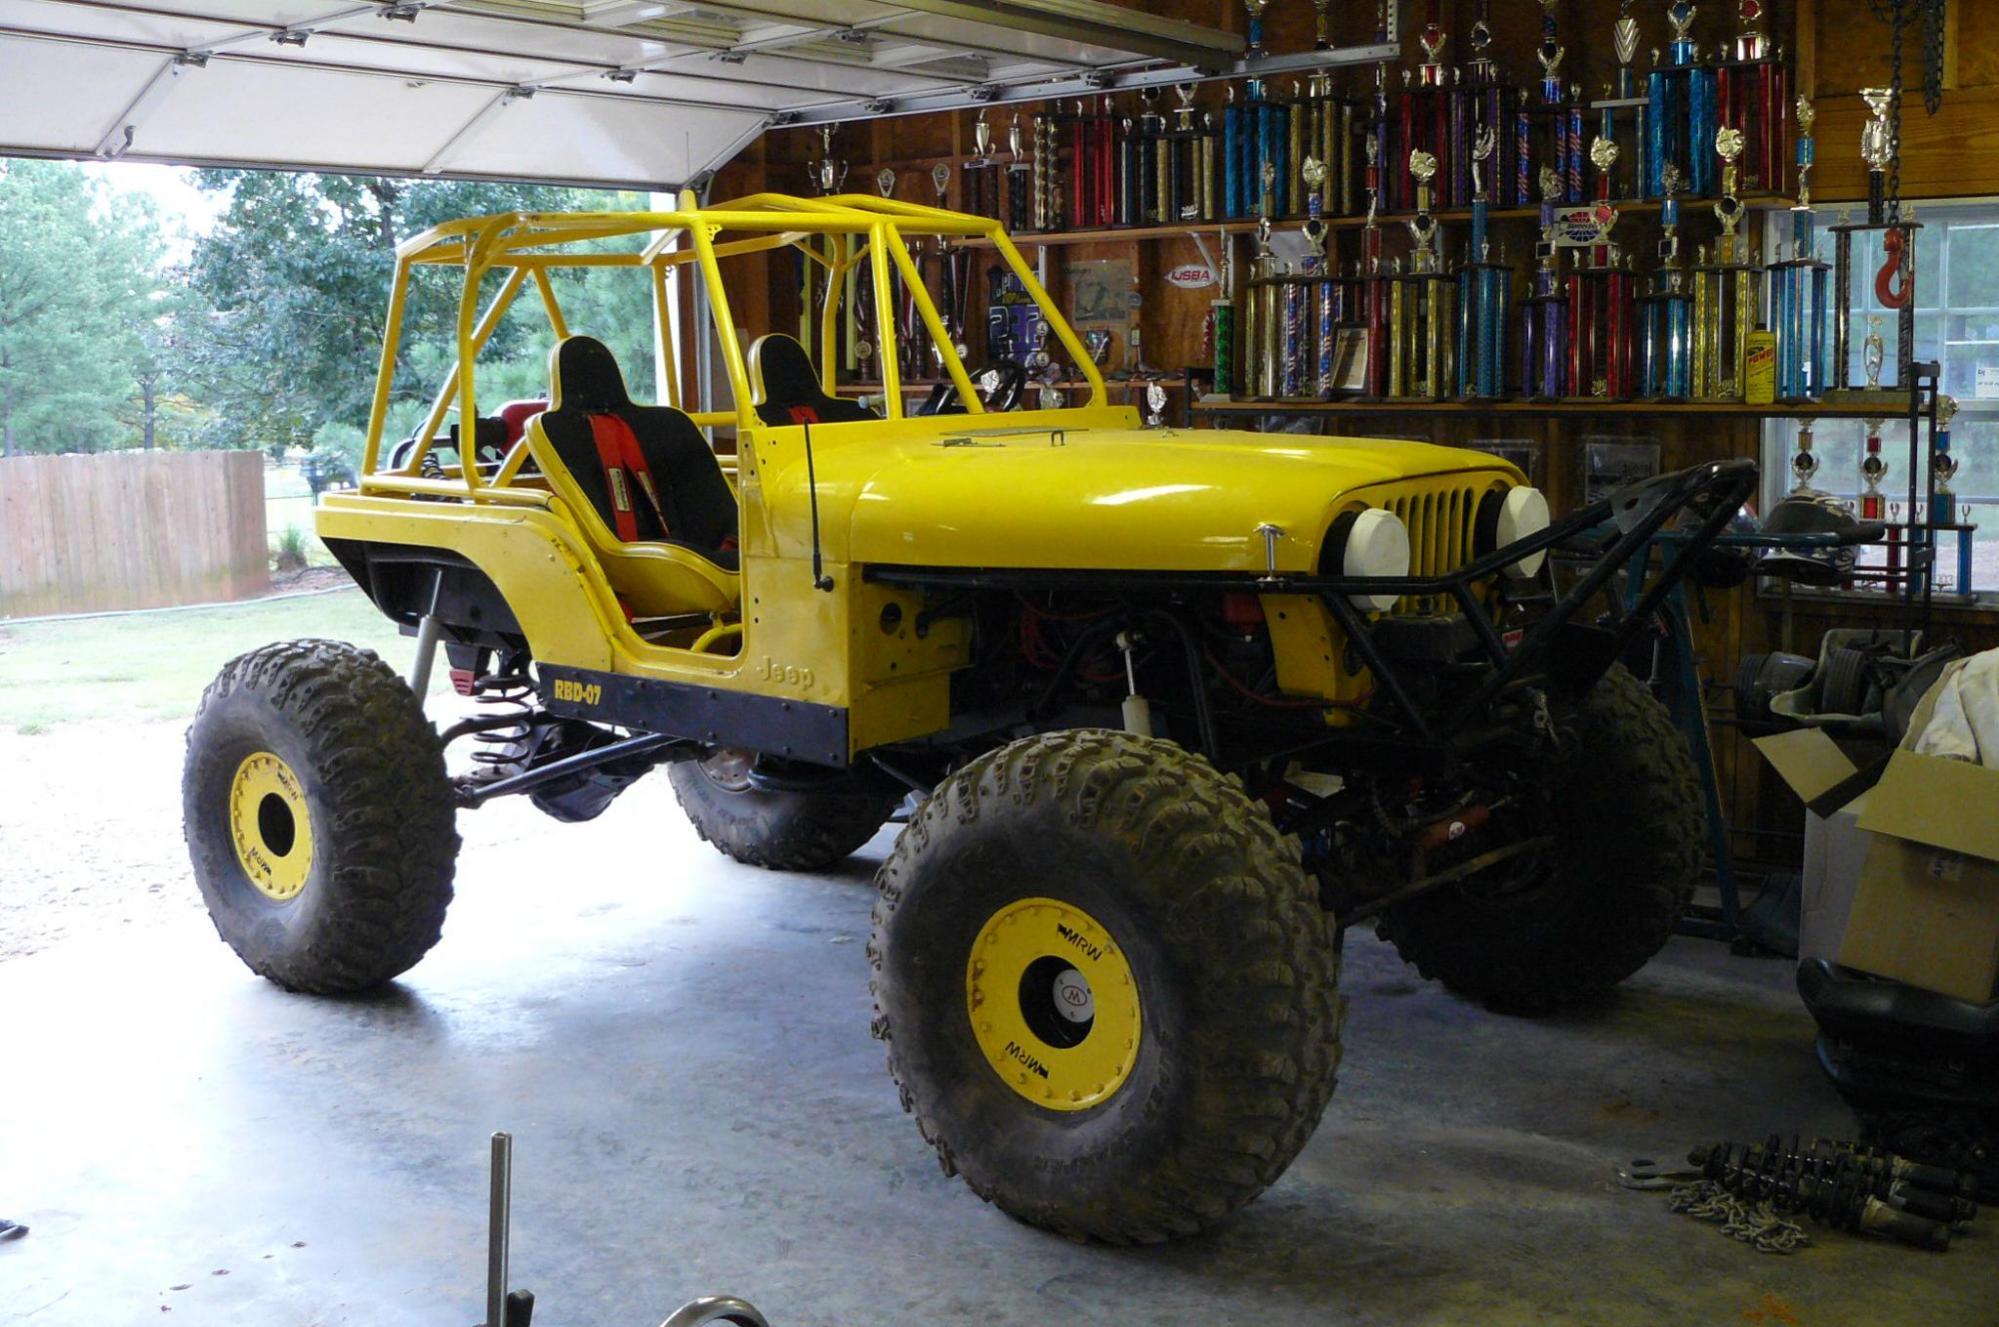 hight resolution of cj5 full tube chassis buggy 1 tons mrw beadlocks iroks and much